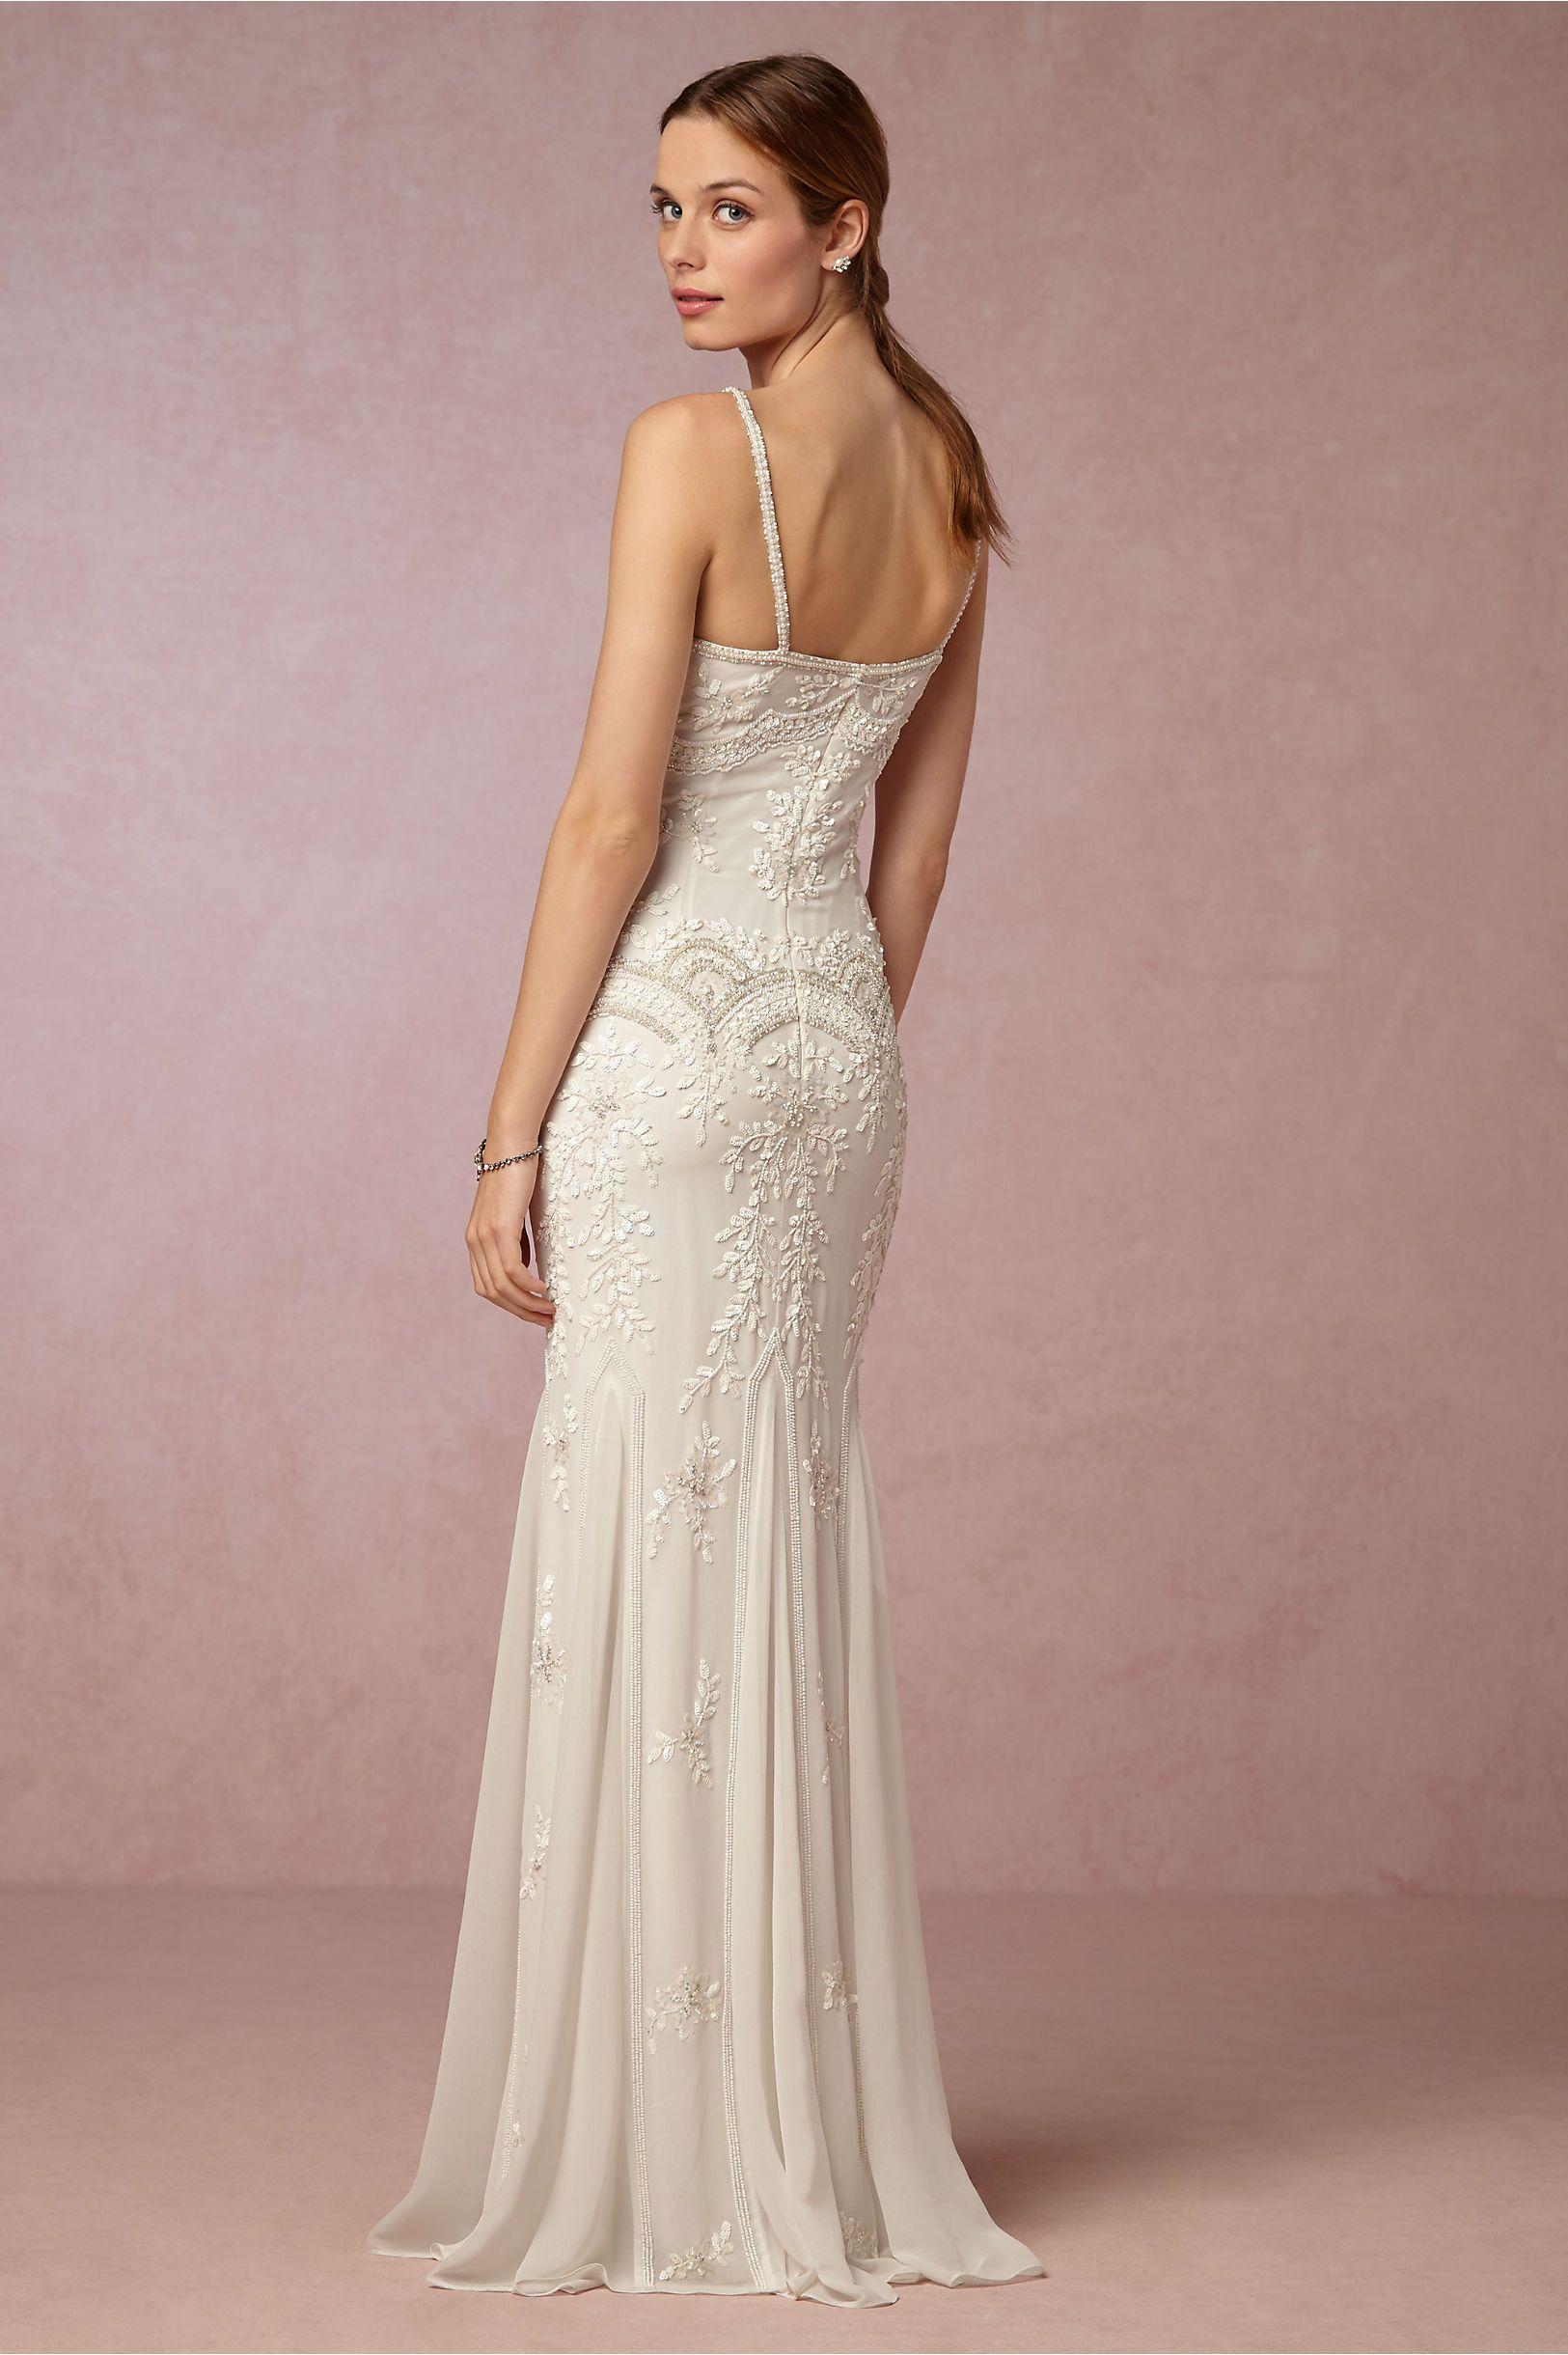 5b560e755a BHLDN Naomi Gown in Beach & Honeymoon   BHLDN   Pram   Wedding ...